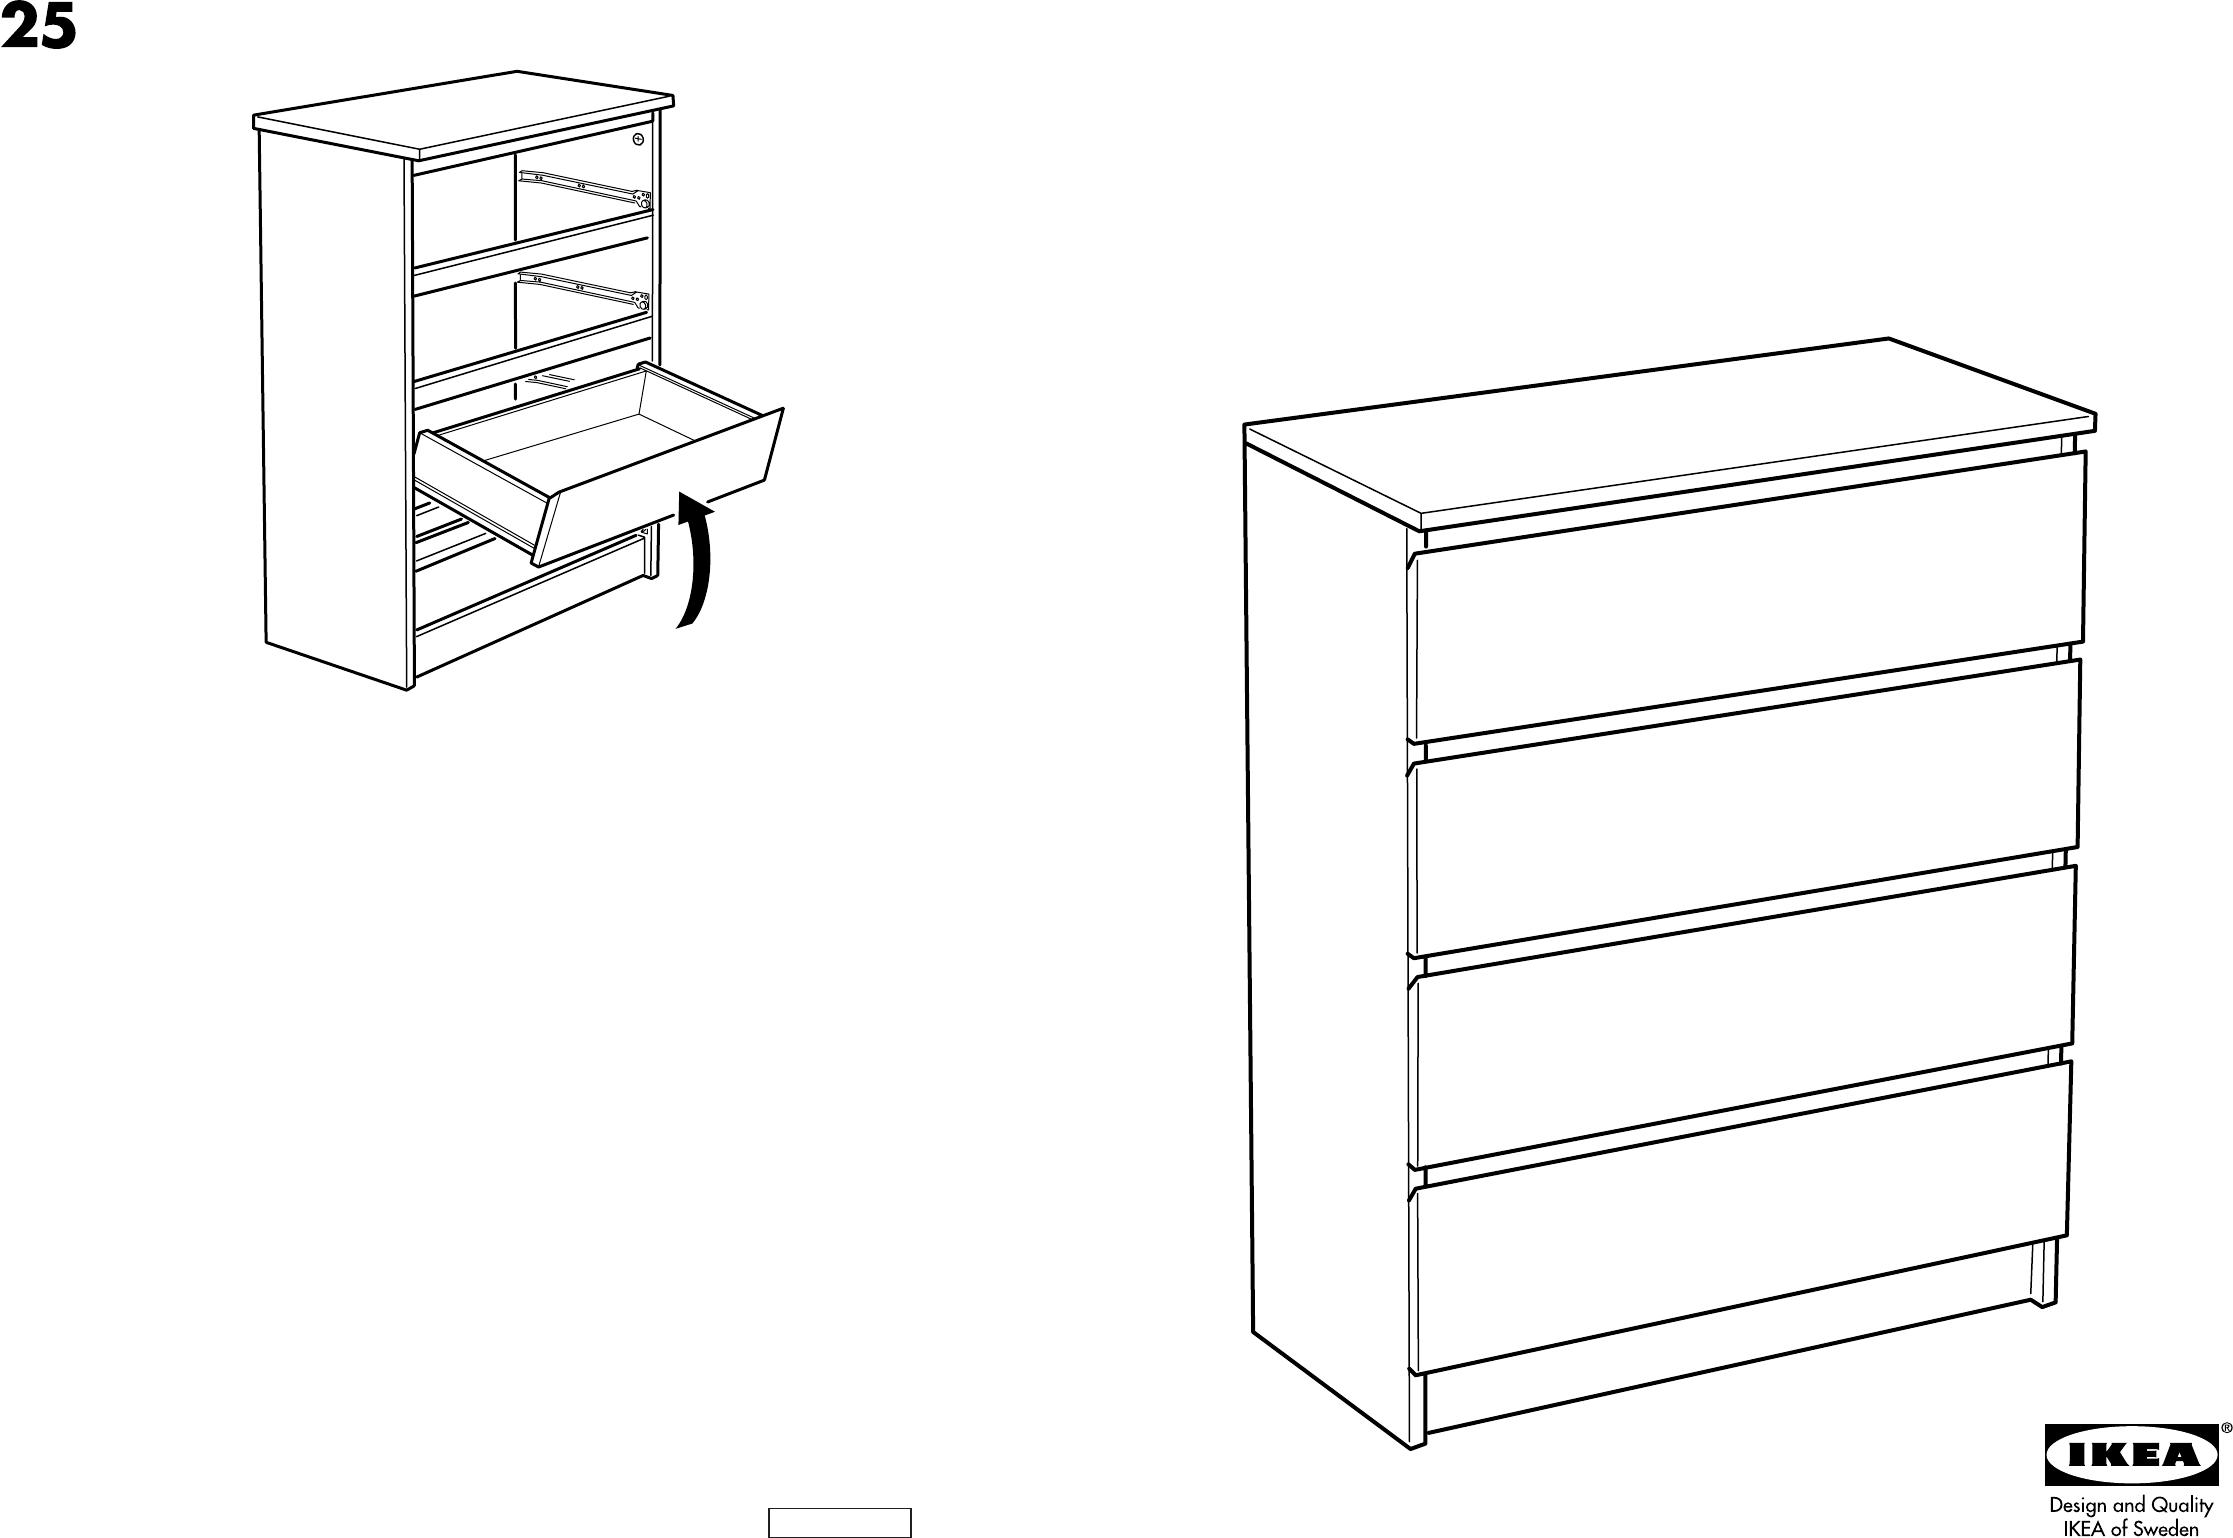 Ikea Malm Ladekast Handleiding.Handleiding Ikea Malm Ladekast 4 Pagina 1 Van 8 Dansk